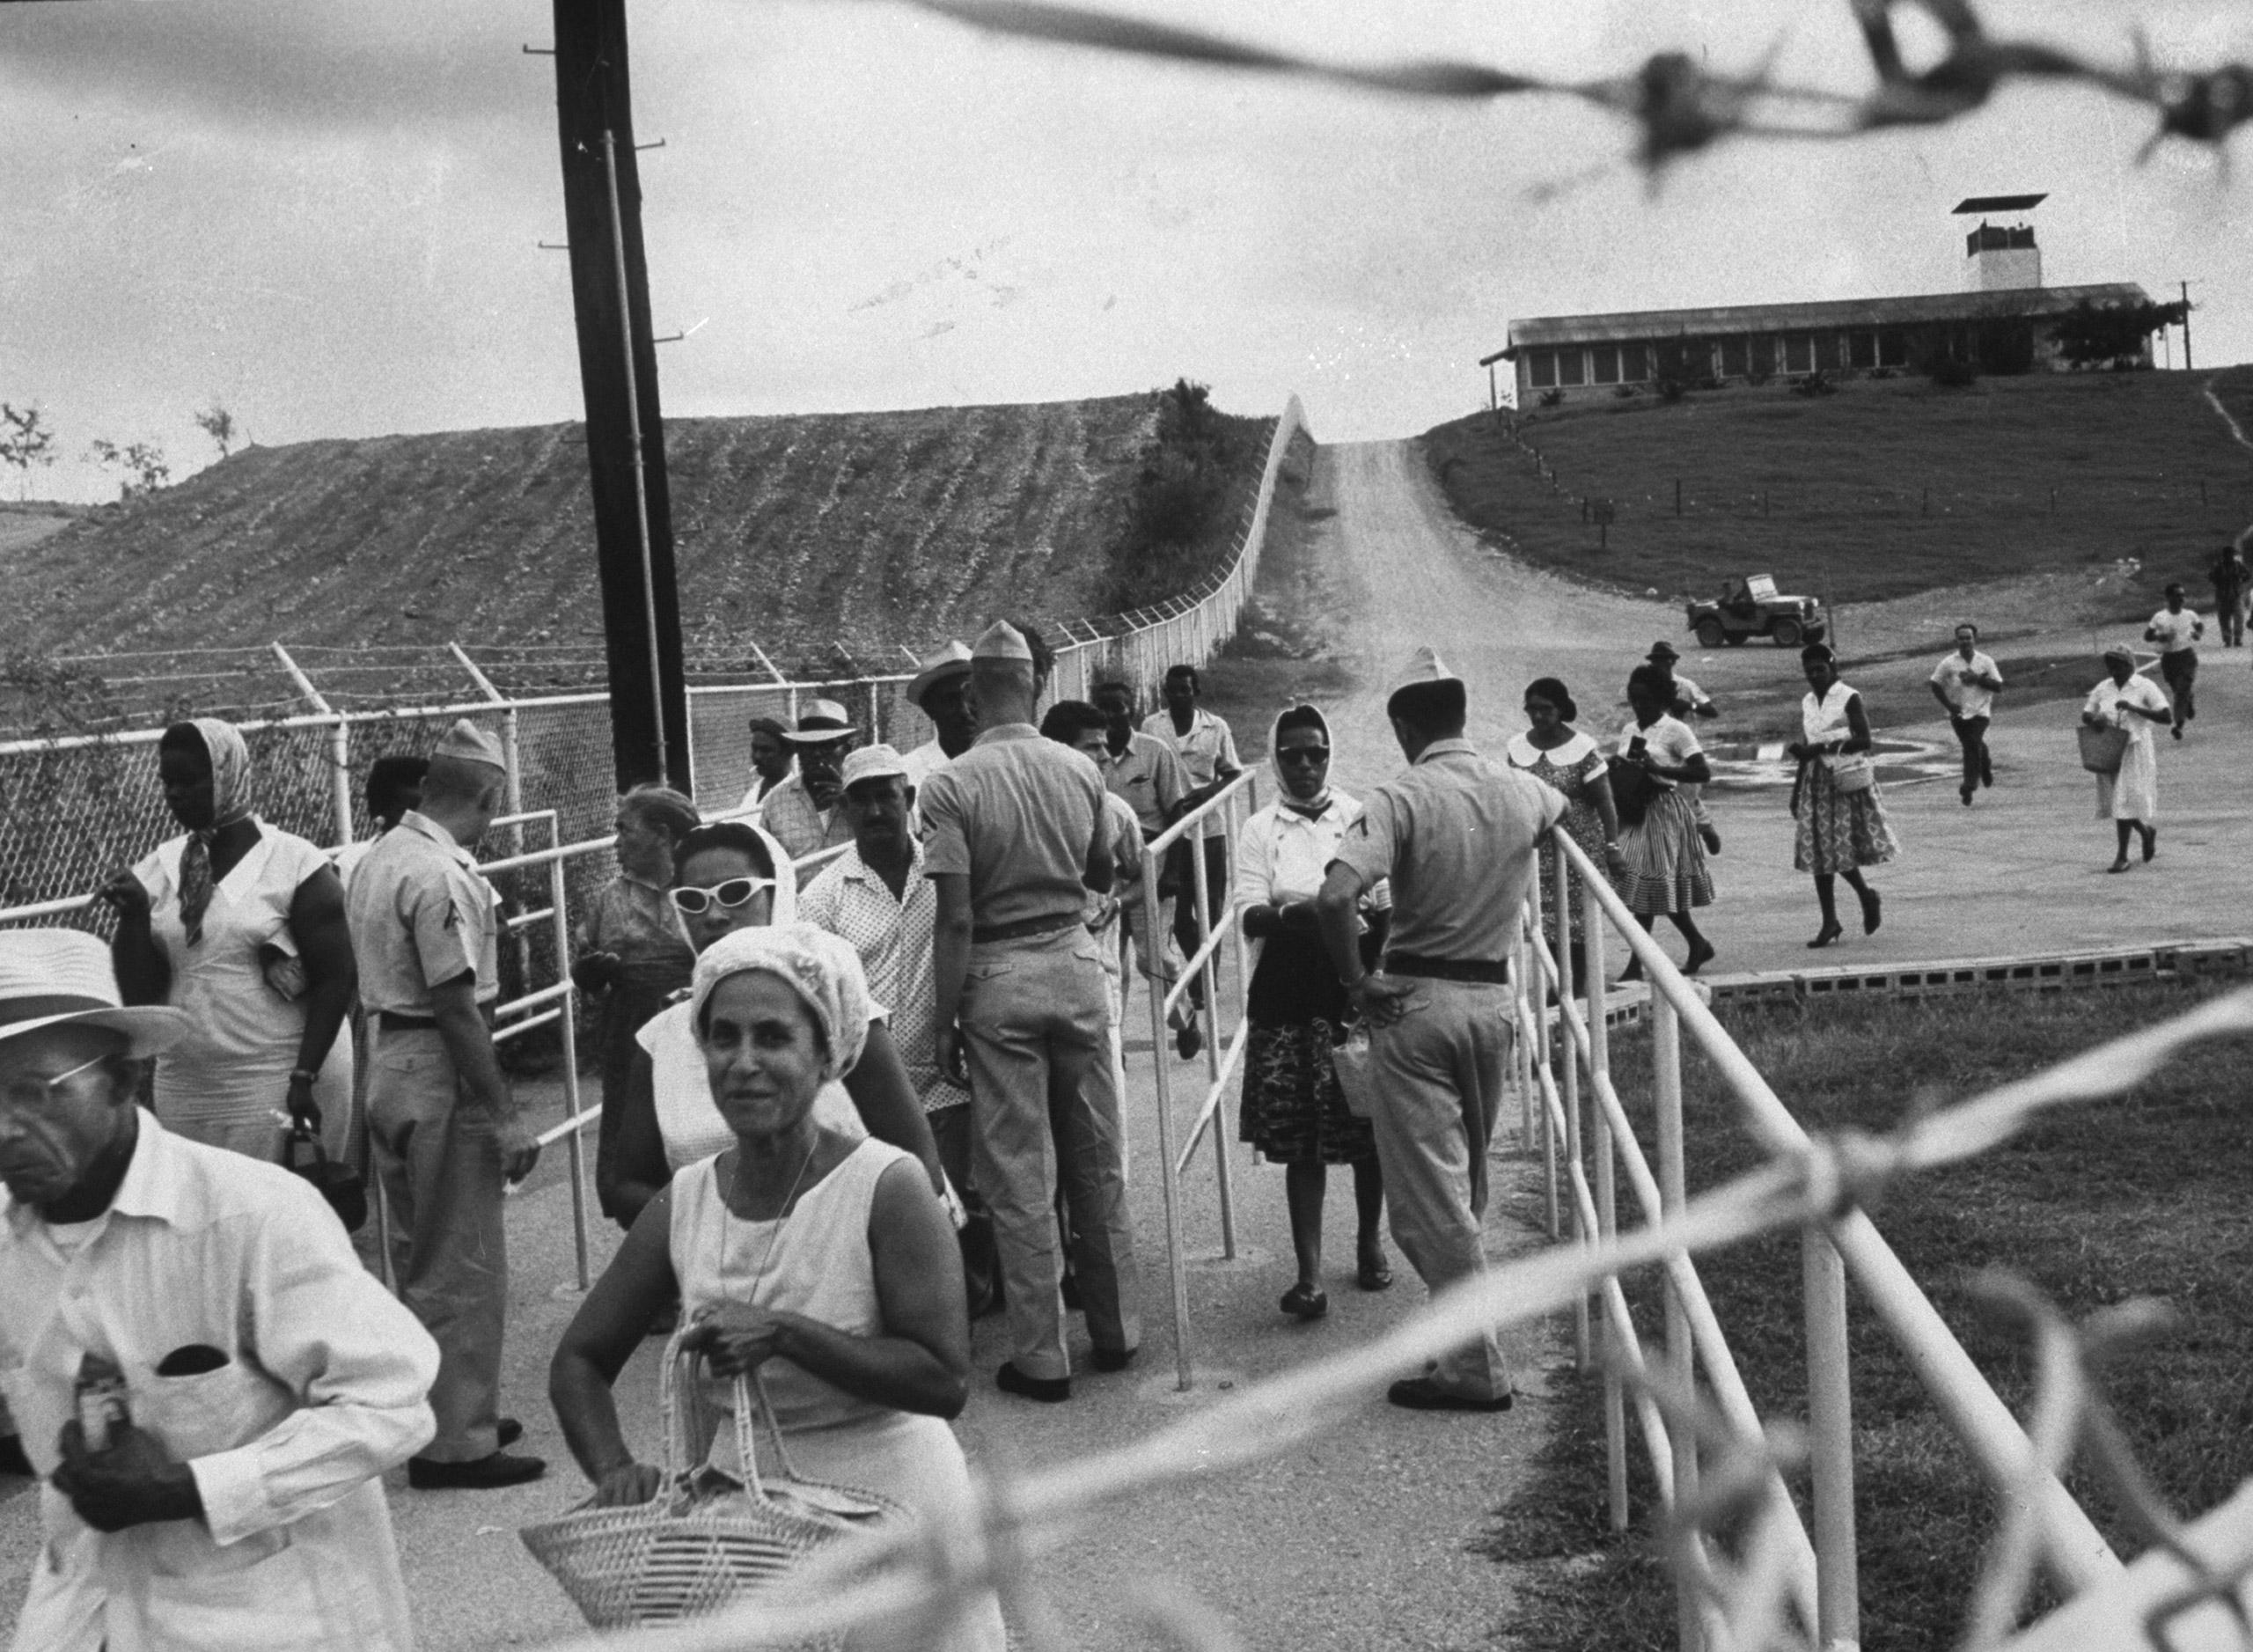 Cuban workers leaving US naval base, Guantanamo Bay, Cuba, 1962.